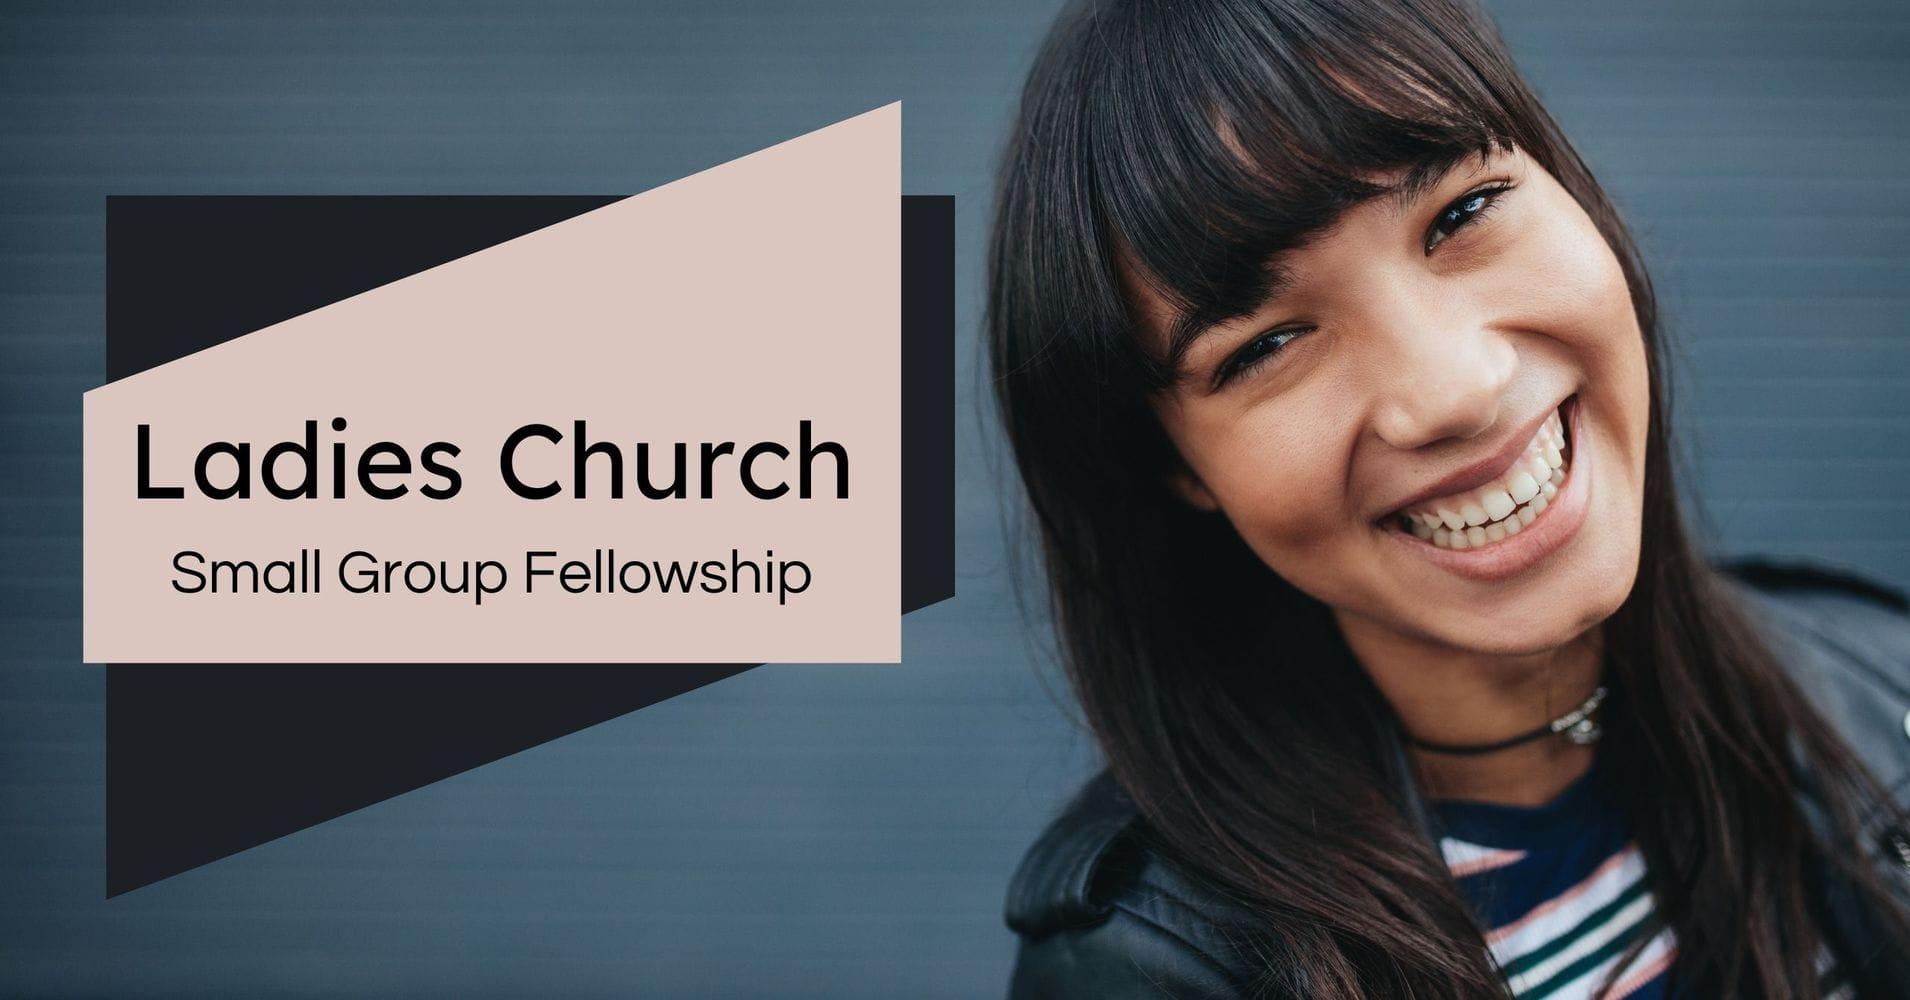 Women's Ministry in Chandler, Arizona